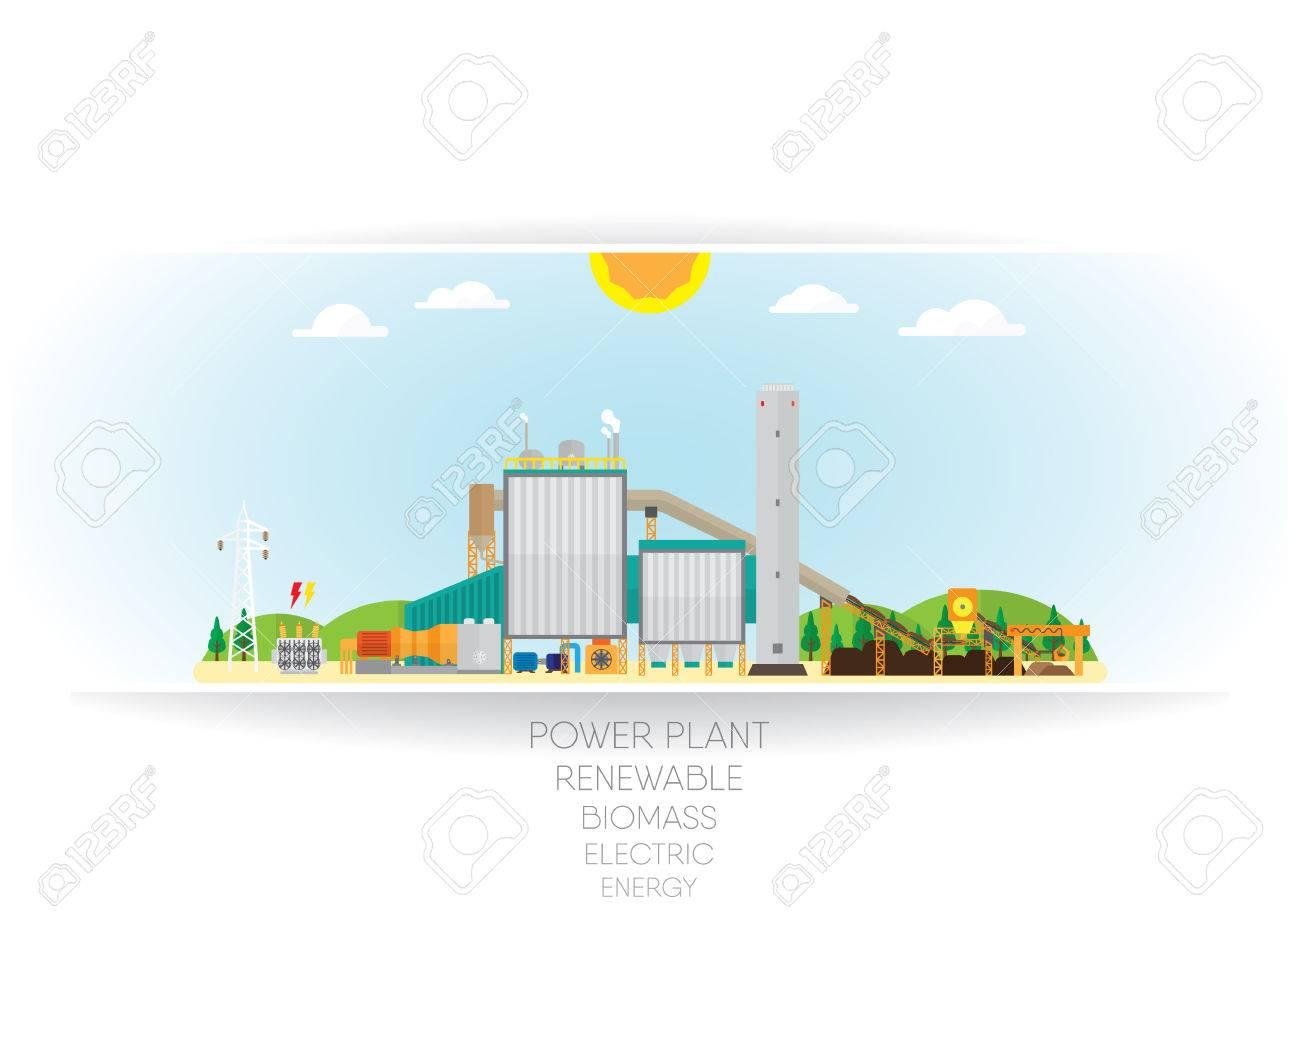 biomass power plant, biomass energy with steam turbine generate